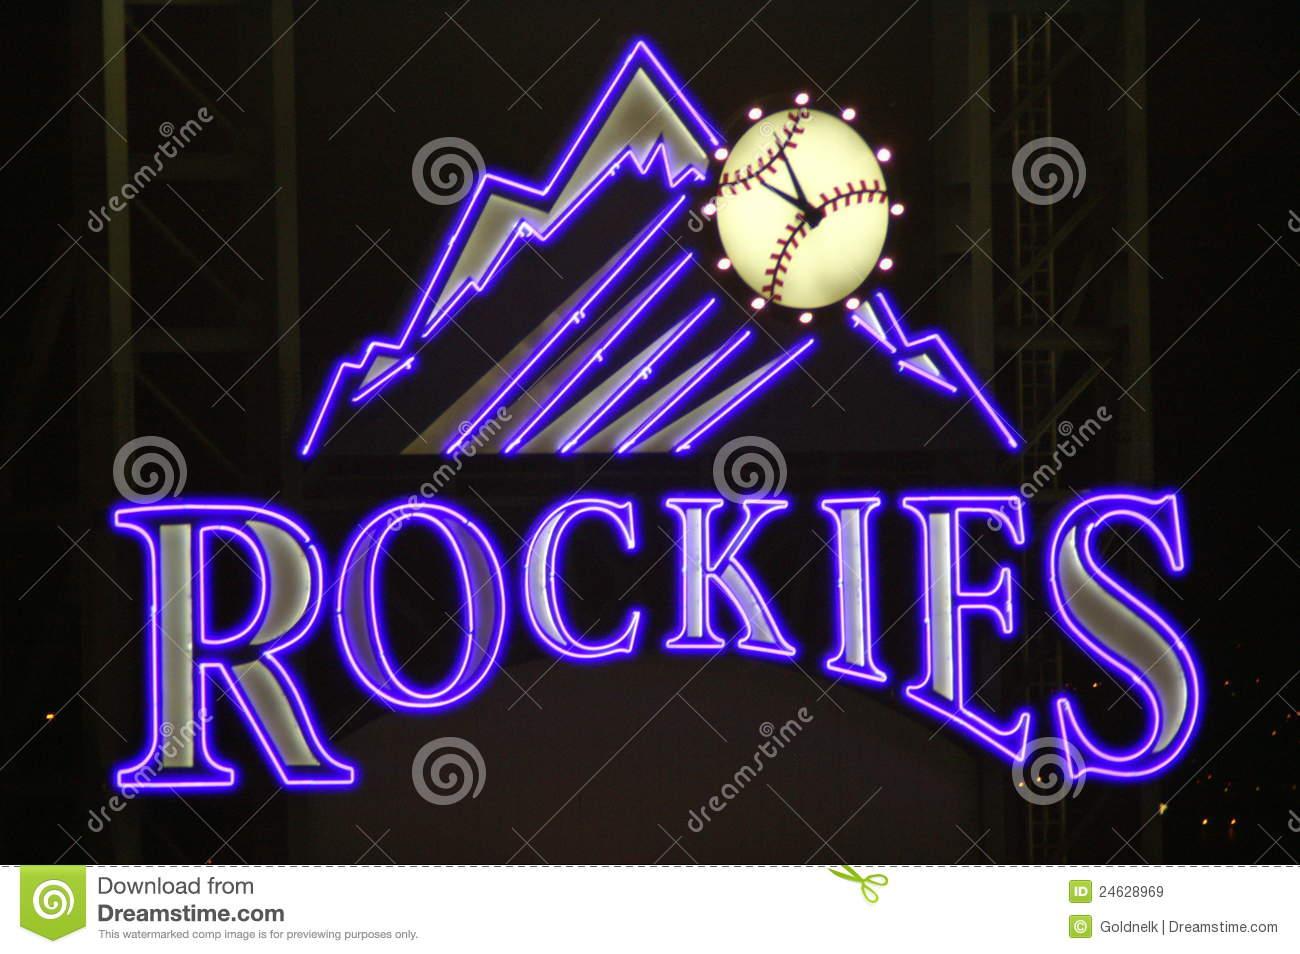 Colorado rockies baseball clipart.